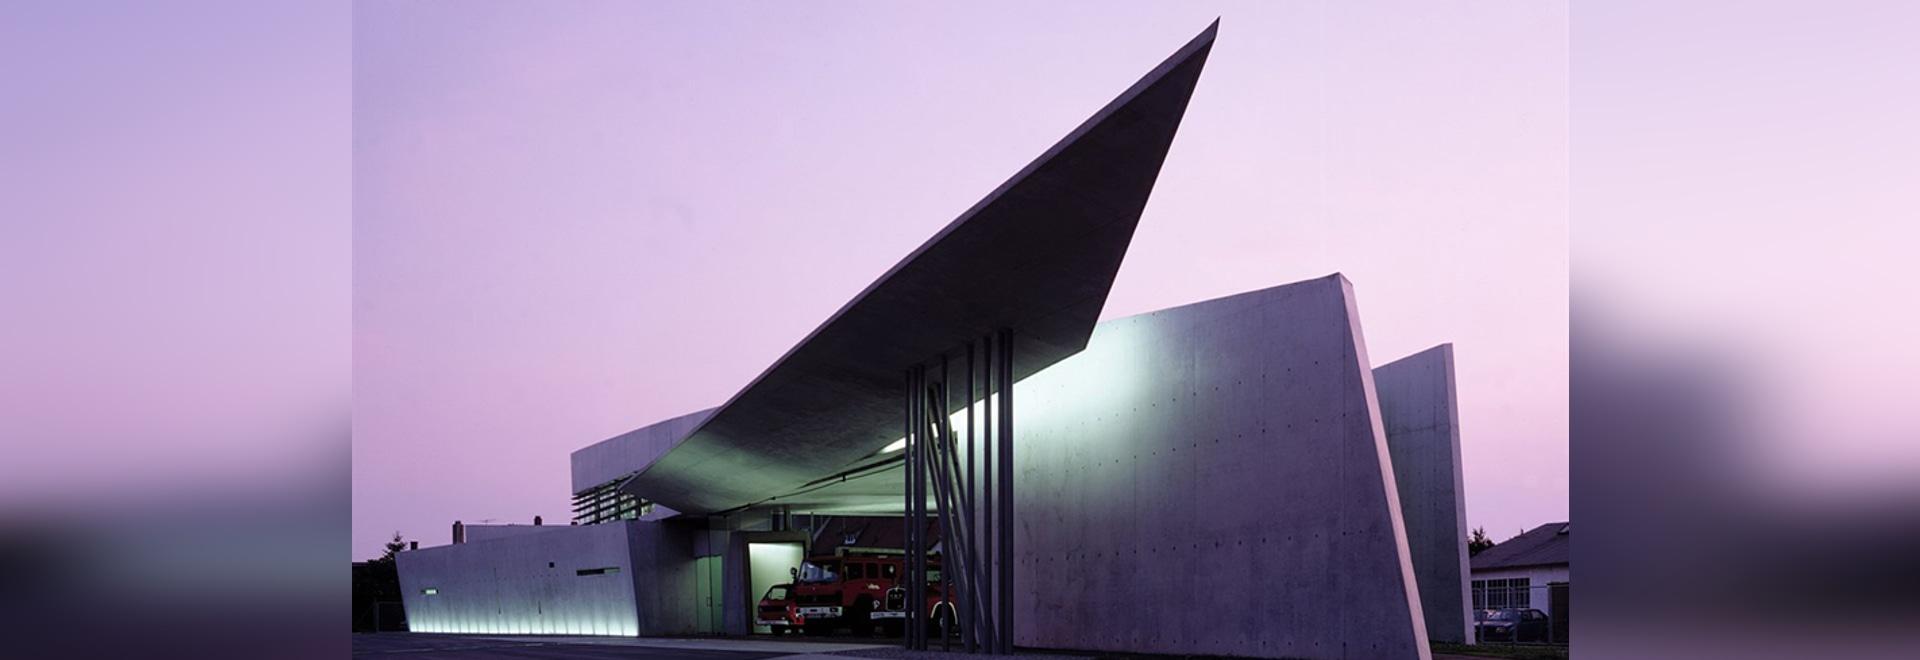 Vitra Fire Station, Weil am Rhein, Germany (Photo: Christian Richters)